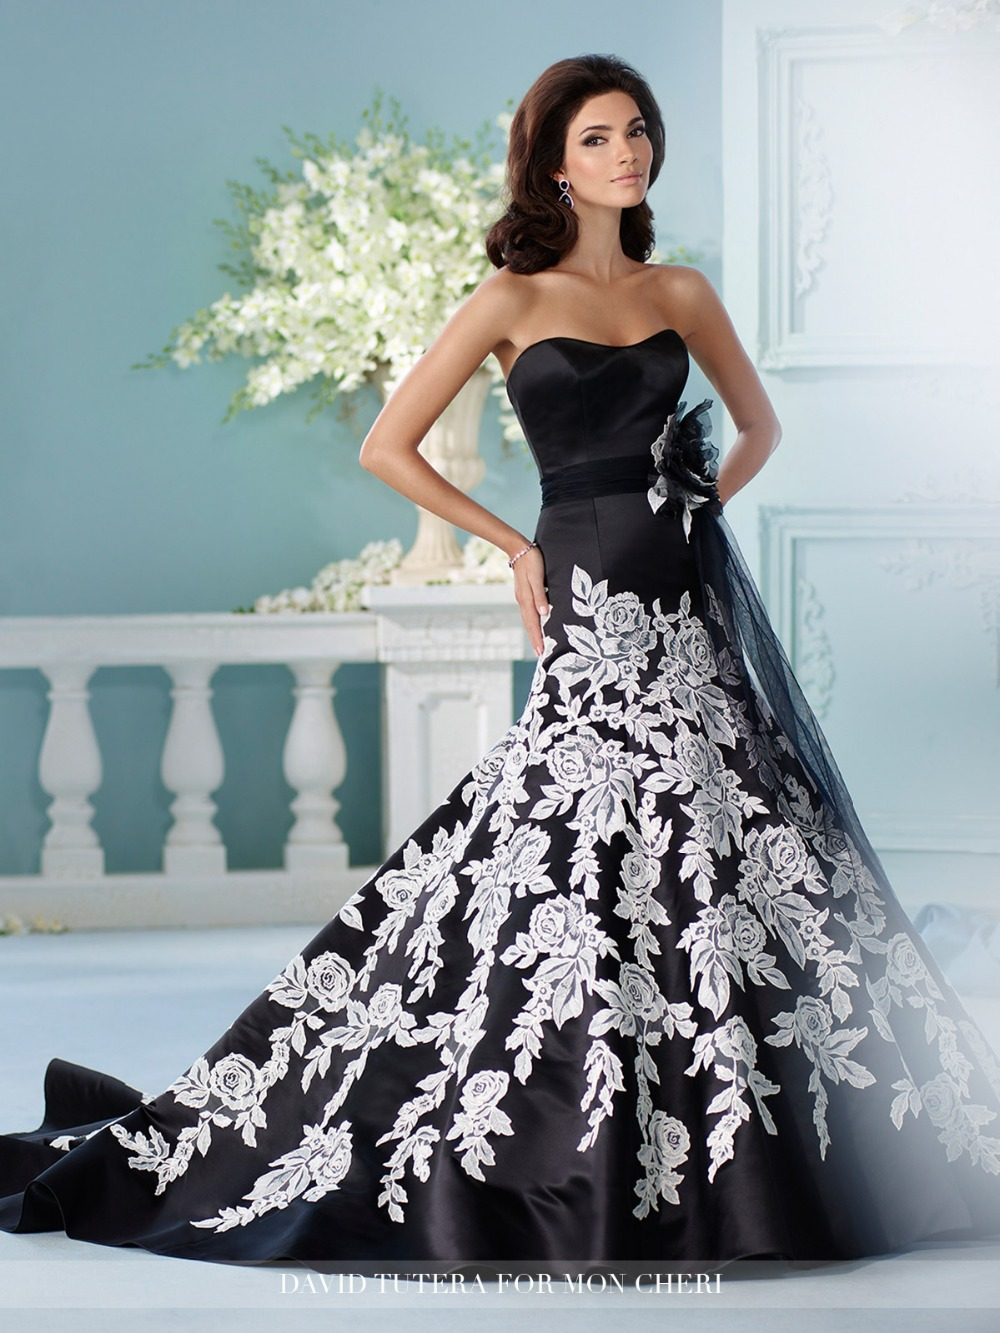 Fine Leather Wedding Dress Motif - Womens Dresses & Gowns ...